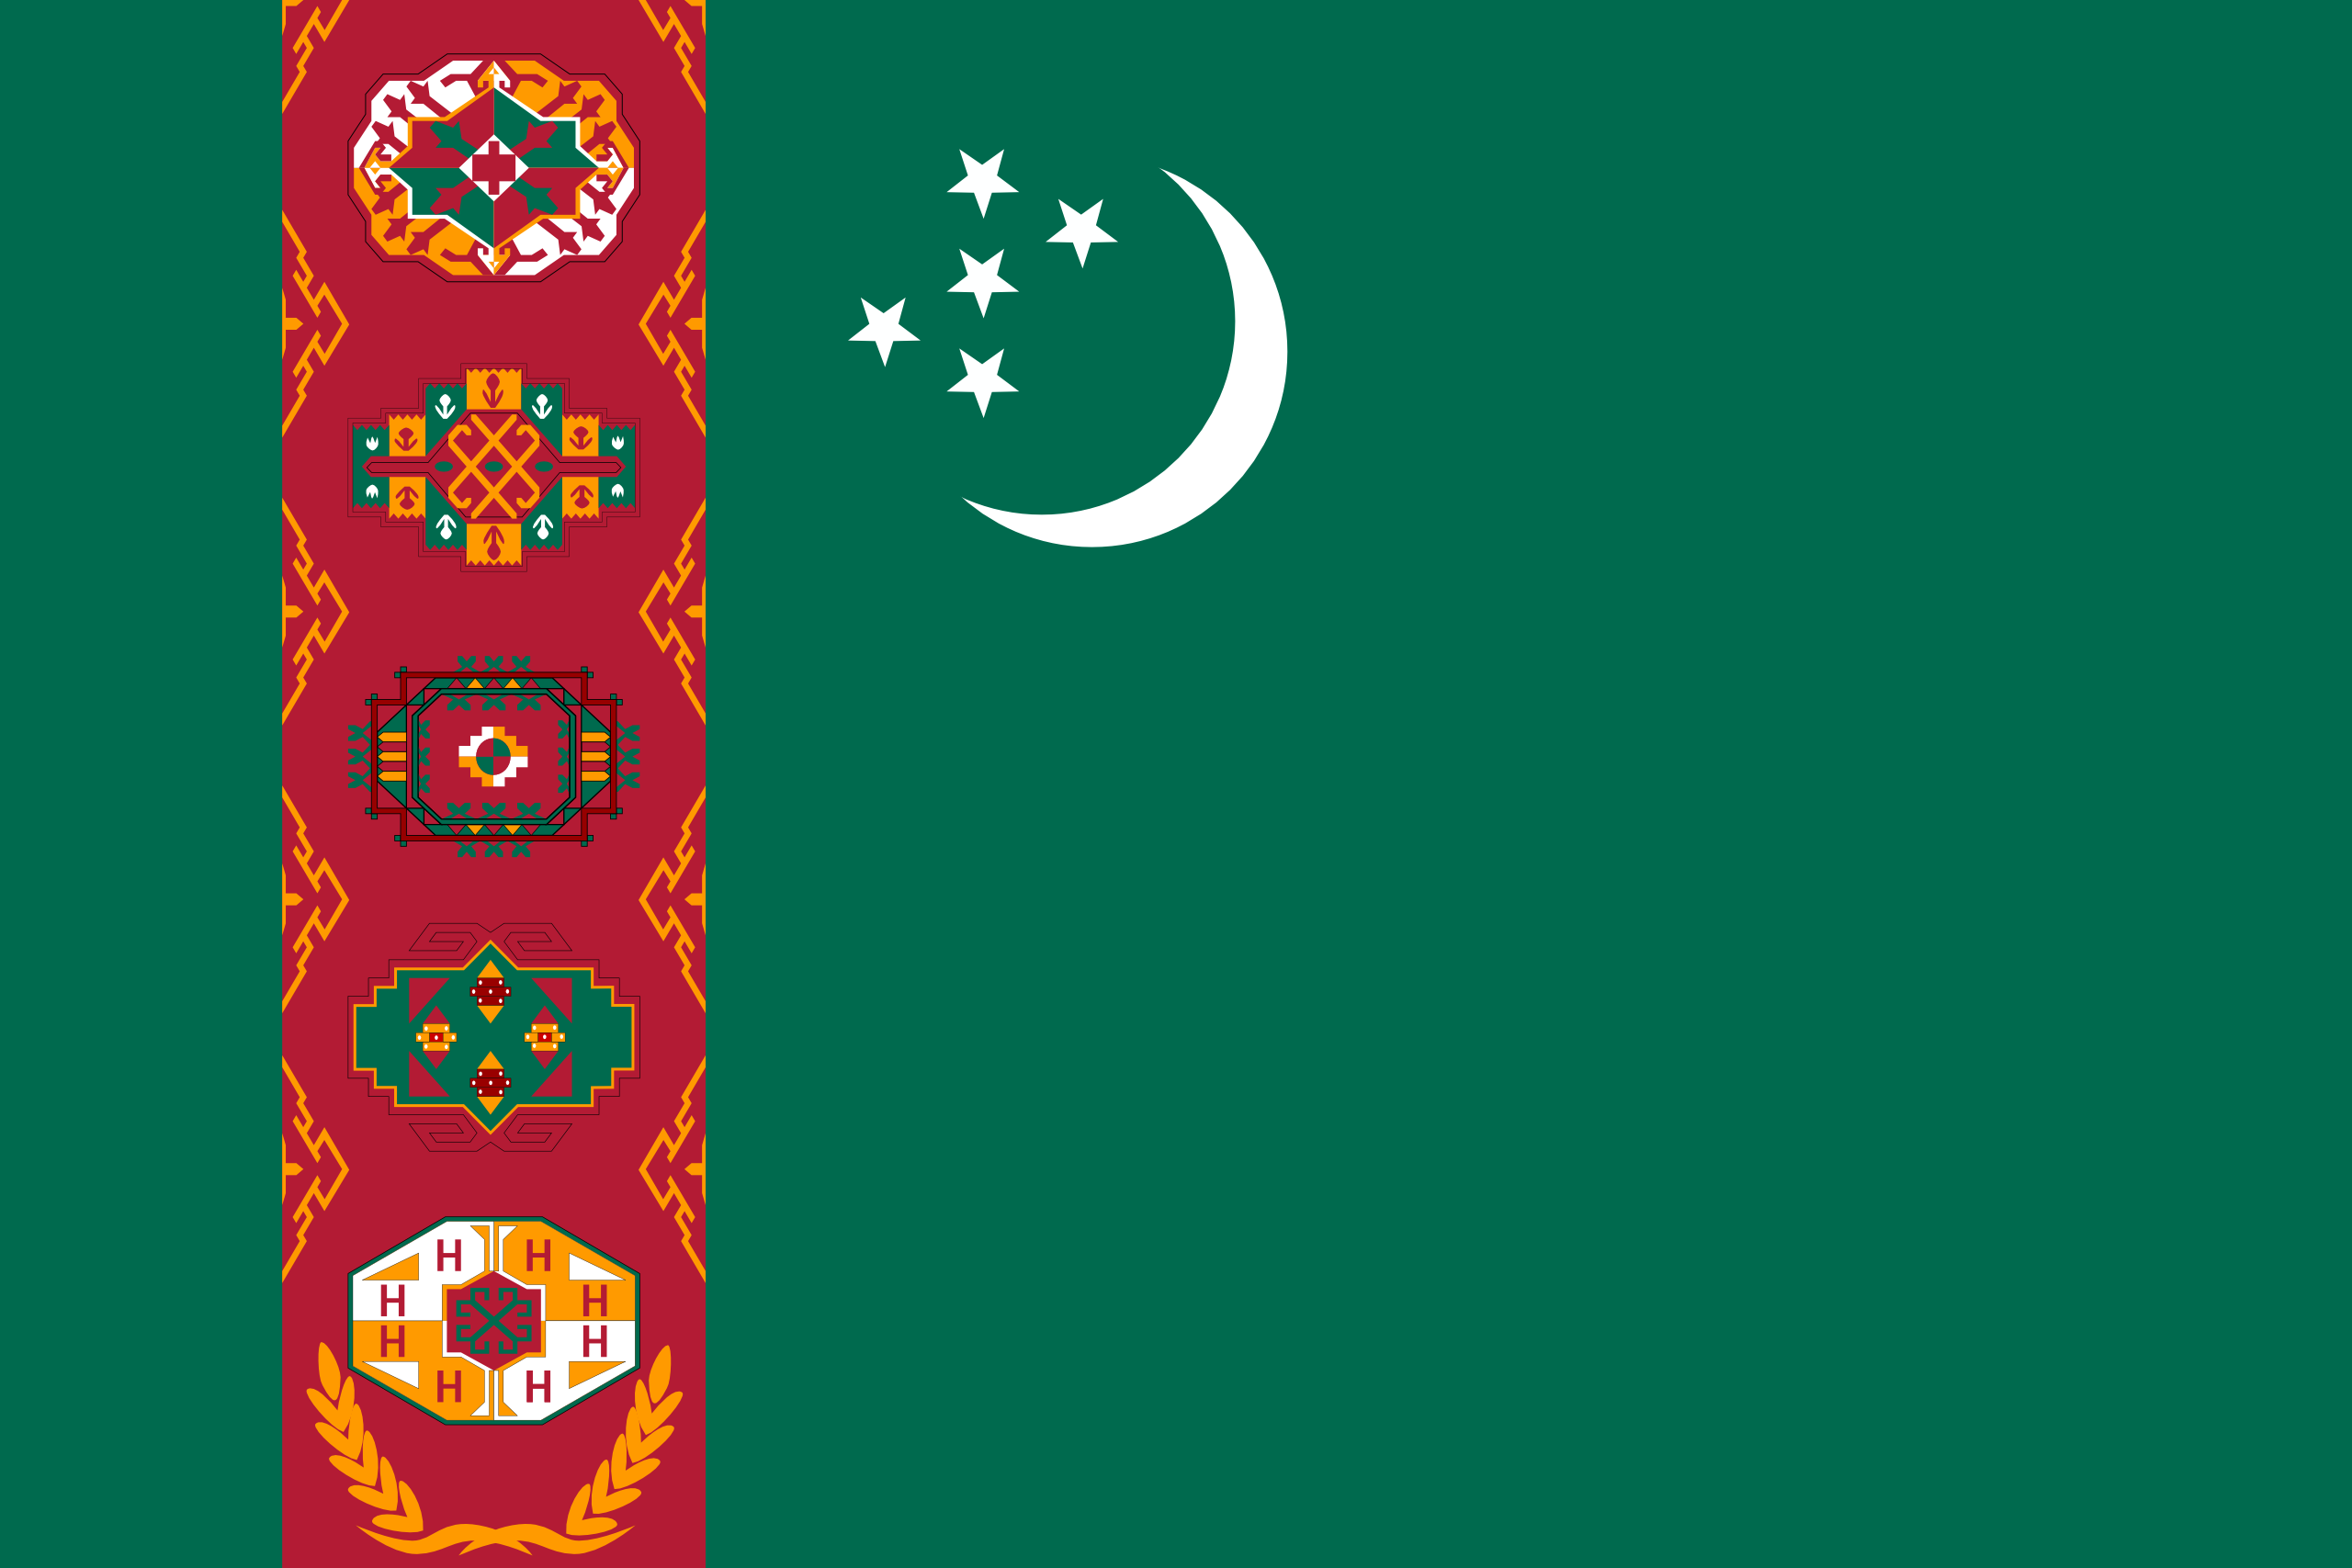 turkmenistán, देश, emblema, लोग�प्रतीकbolo - HD वॉलपेपर - प्रोफेसर-falken.com